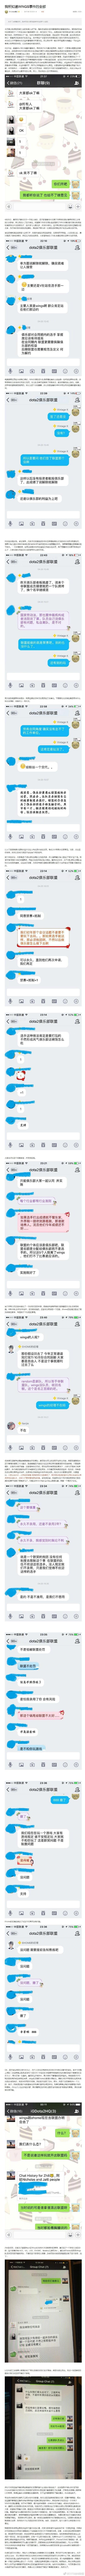 Shadow发文祝福前队友 iG藏马长文叙封杀始末